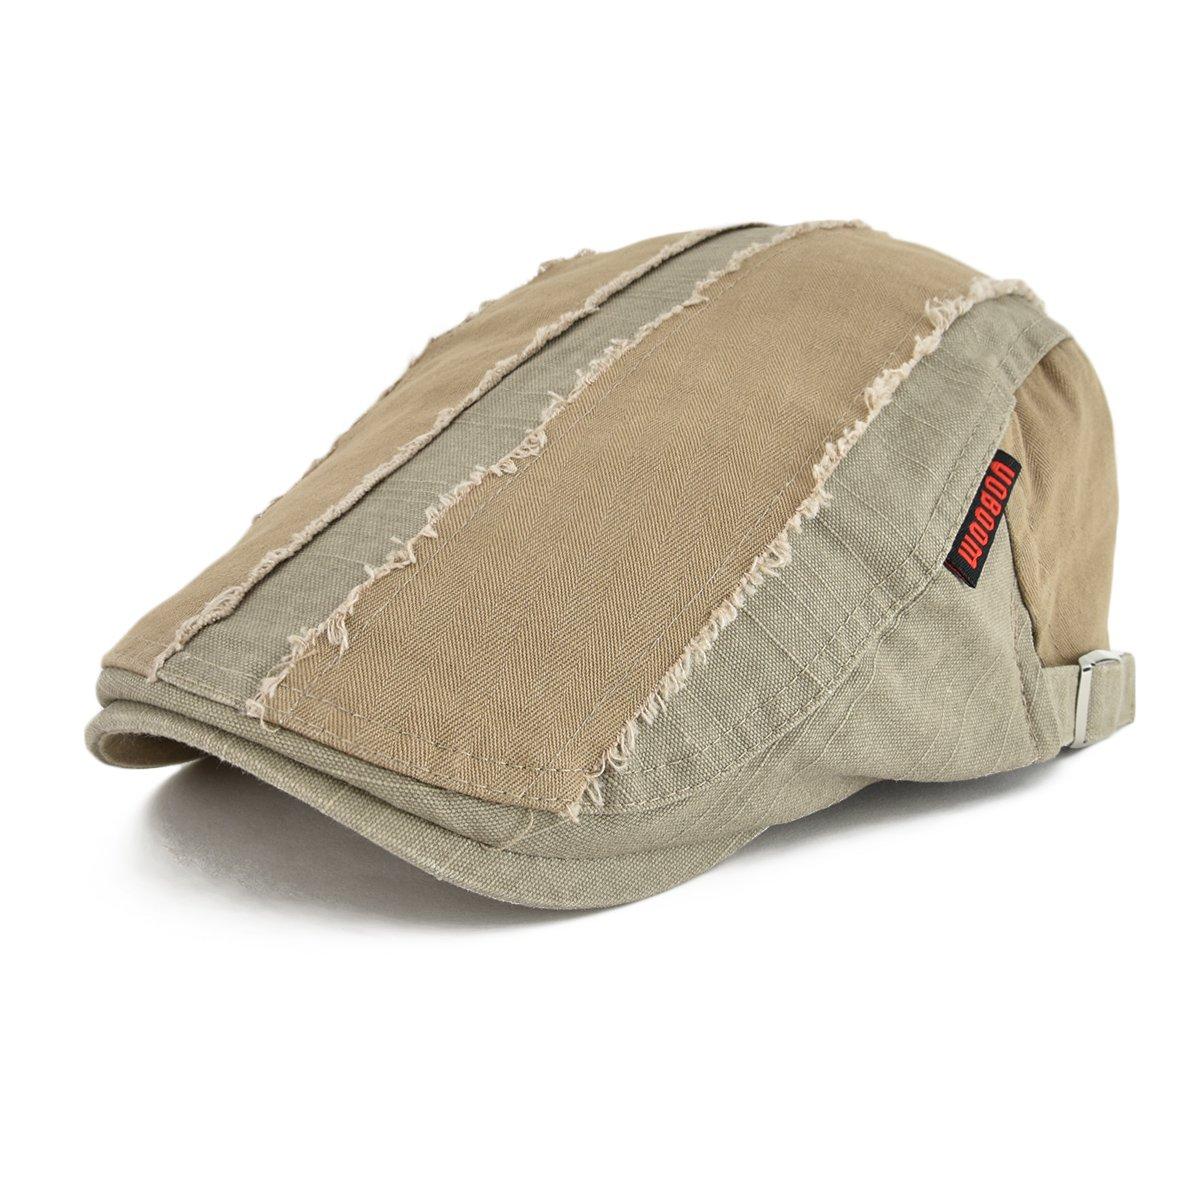 VOBOOM 100% Cotton Distressed Ivy Caps Newsboy Caps Cabbie Hat Gatsby Hat (Khaki)